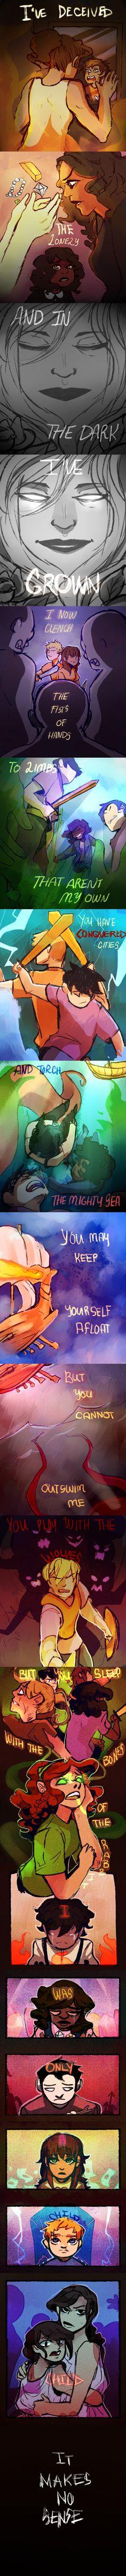 Percy Jackson - Bones of a Rabbit   art by joker-ace